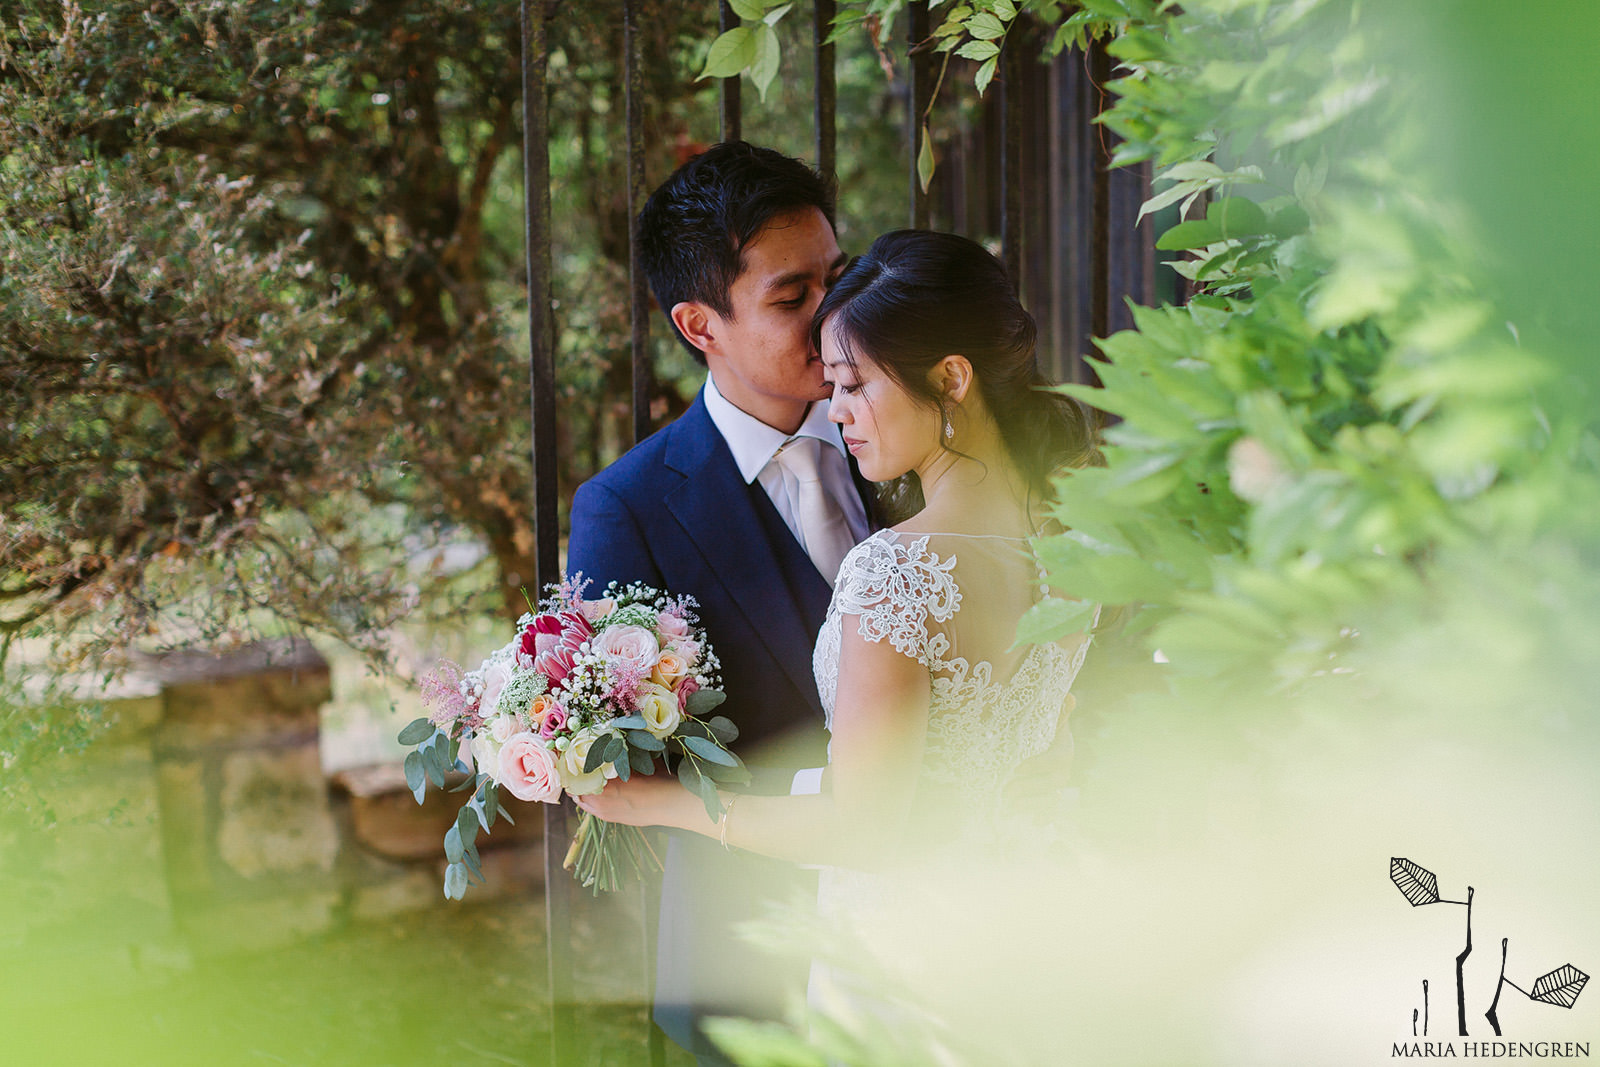 Lagorce wedding photographer